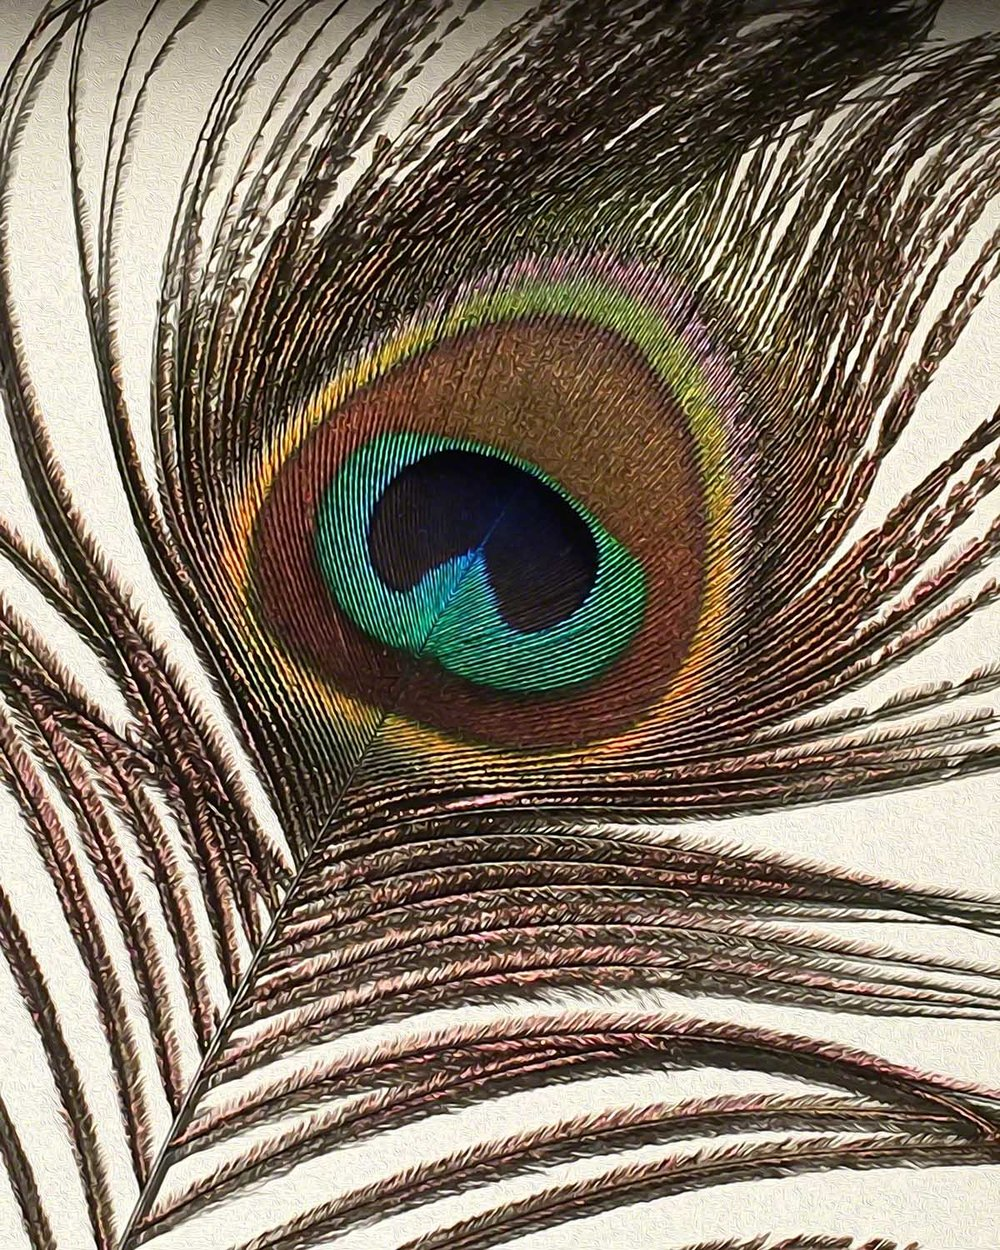 Primal Eye - 20